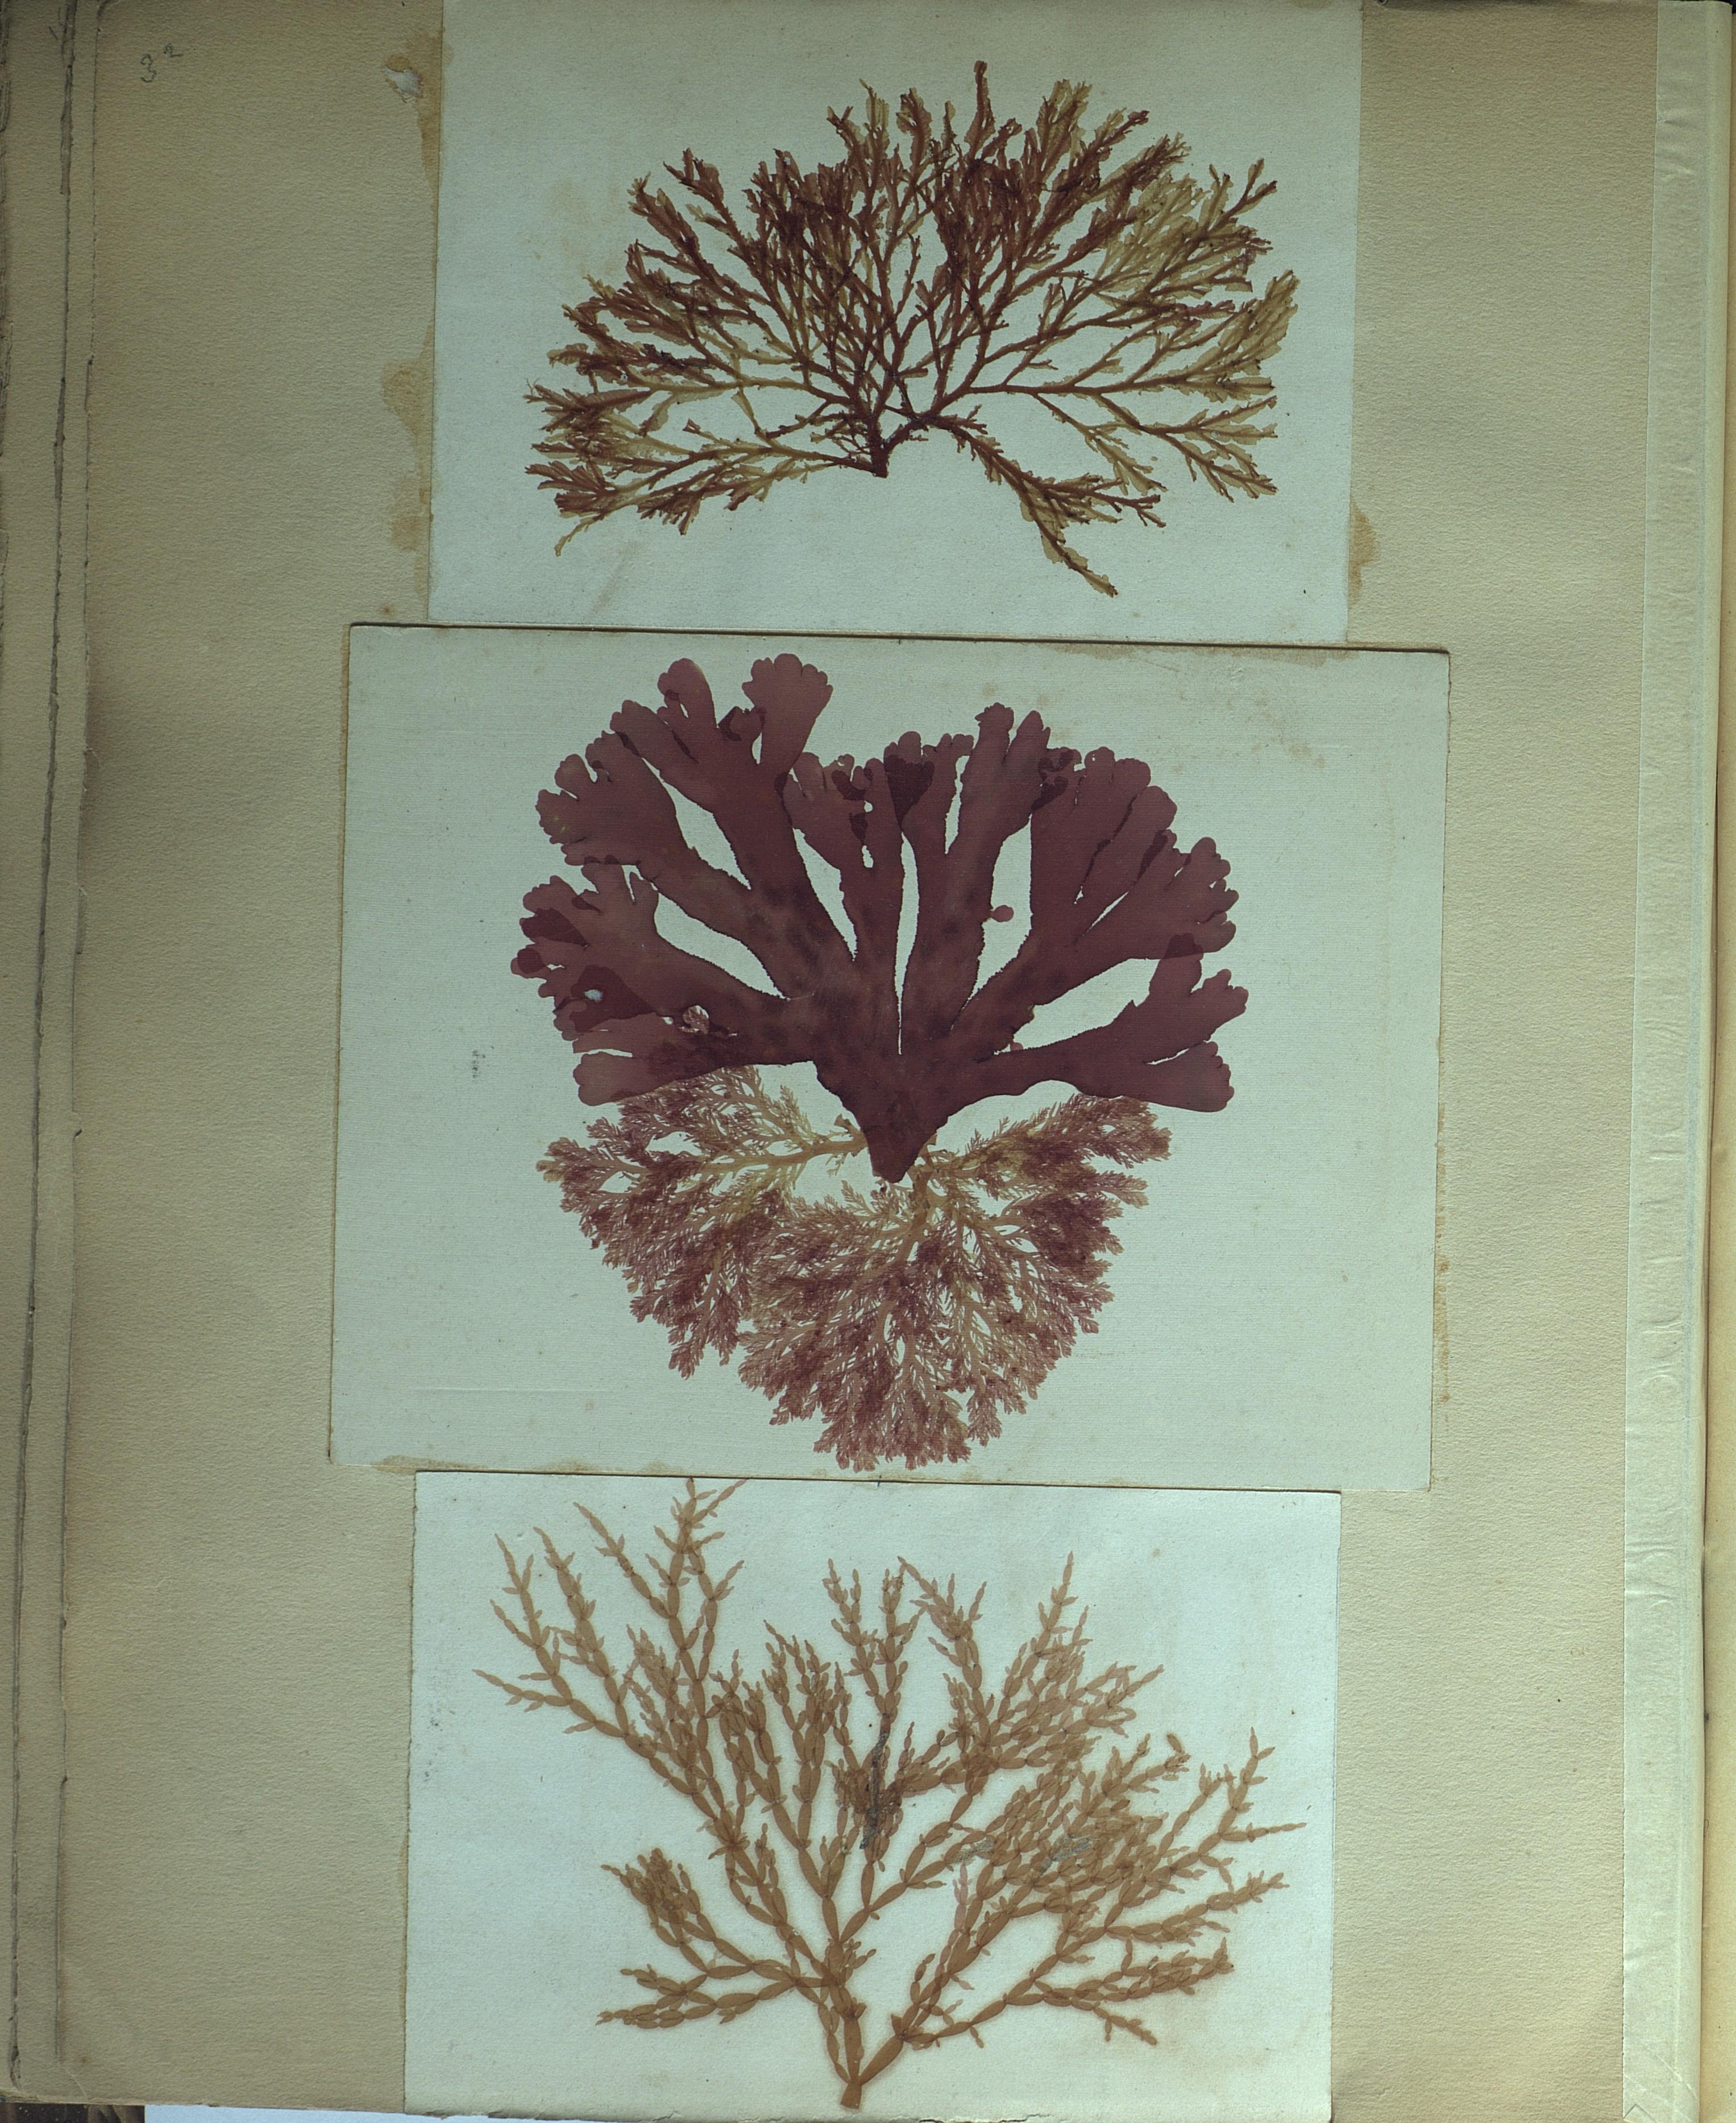 file emile carot herbier d algues marines wikimedia commons. Black Bedroom Furniture Sets. Home Design Ideas